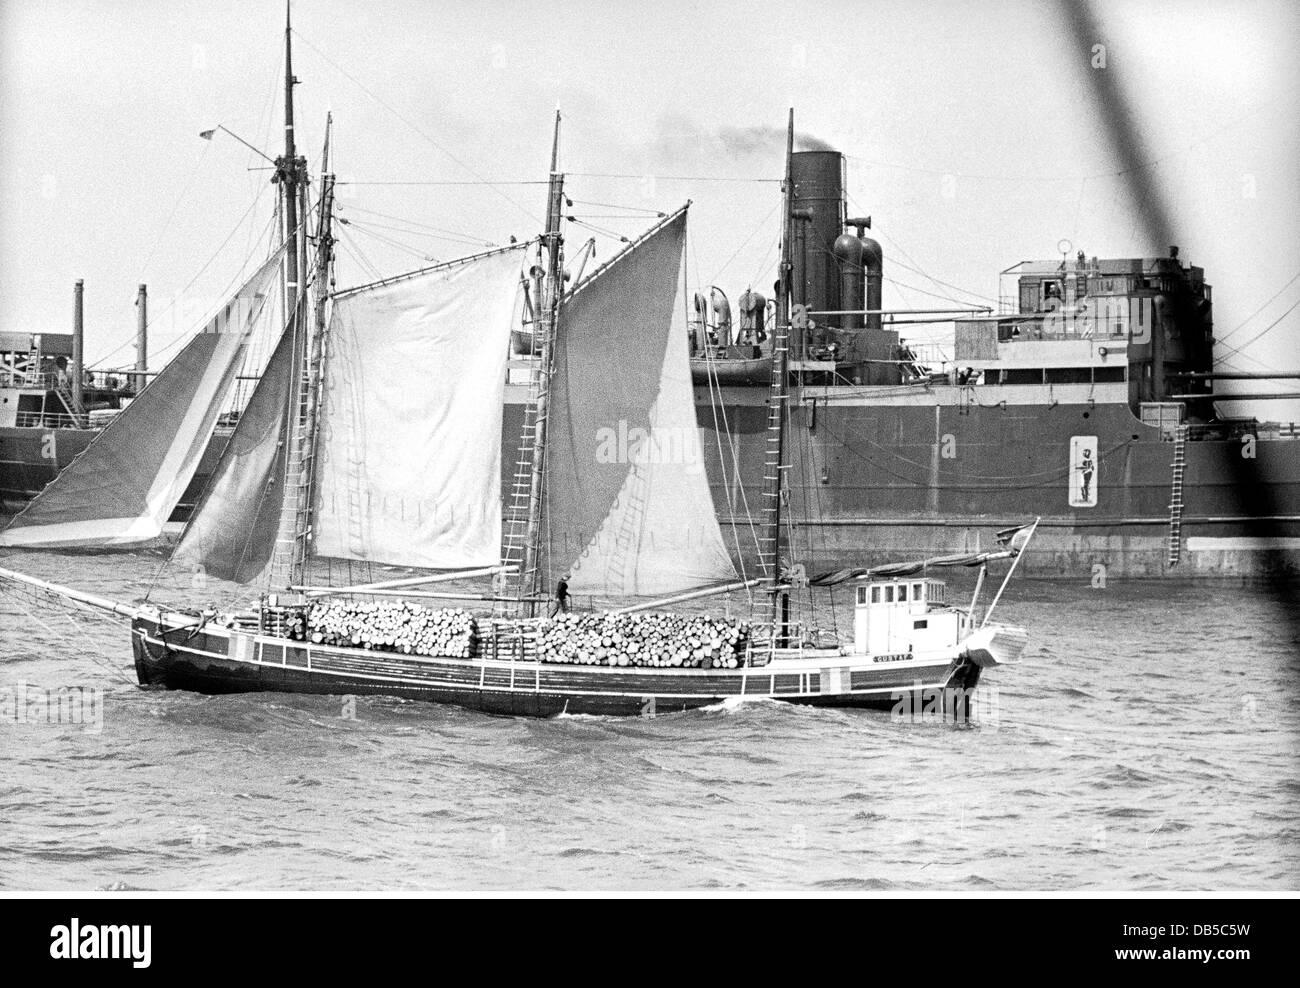 transport / transportation, navigation, sailing ships, sailing ship at the harbour of Stettin, Germany, 1940 / 1941, - Stock Image